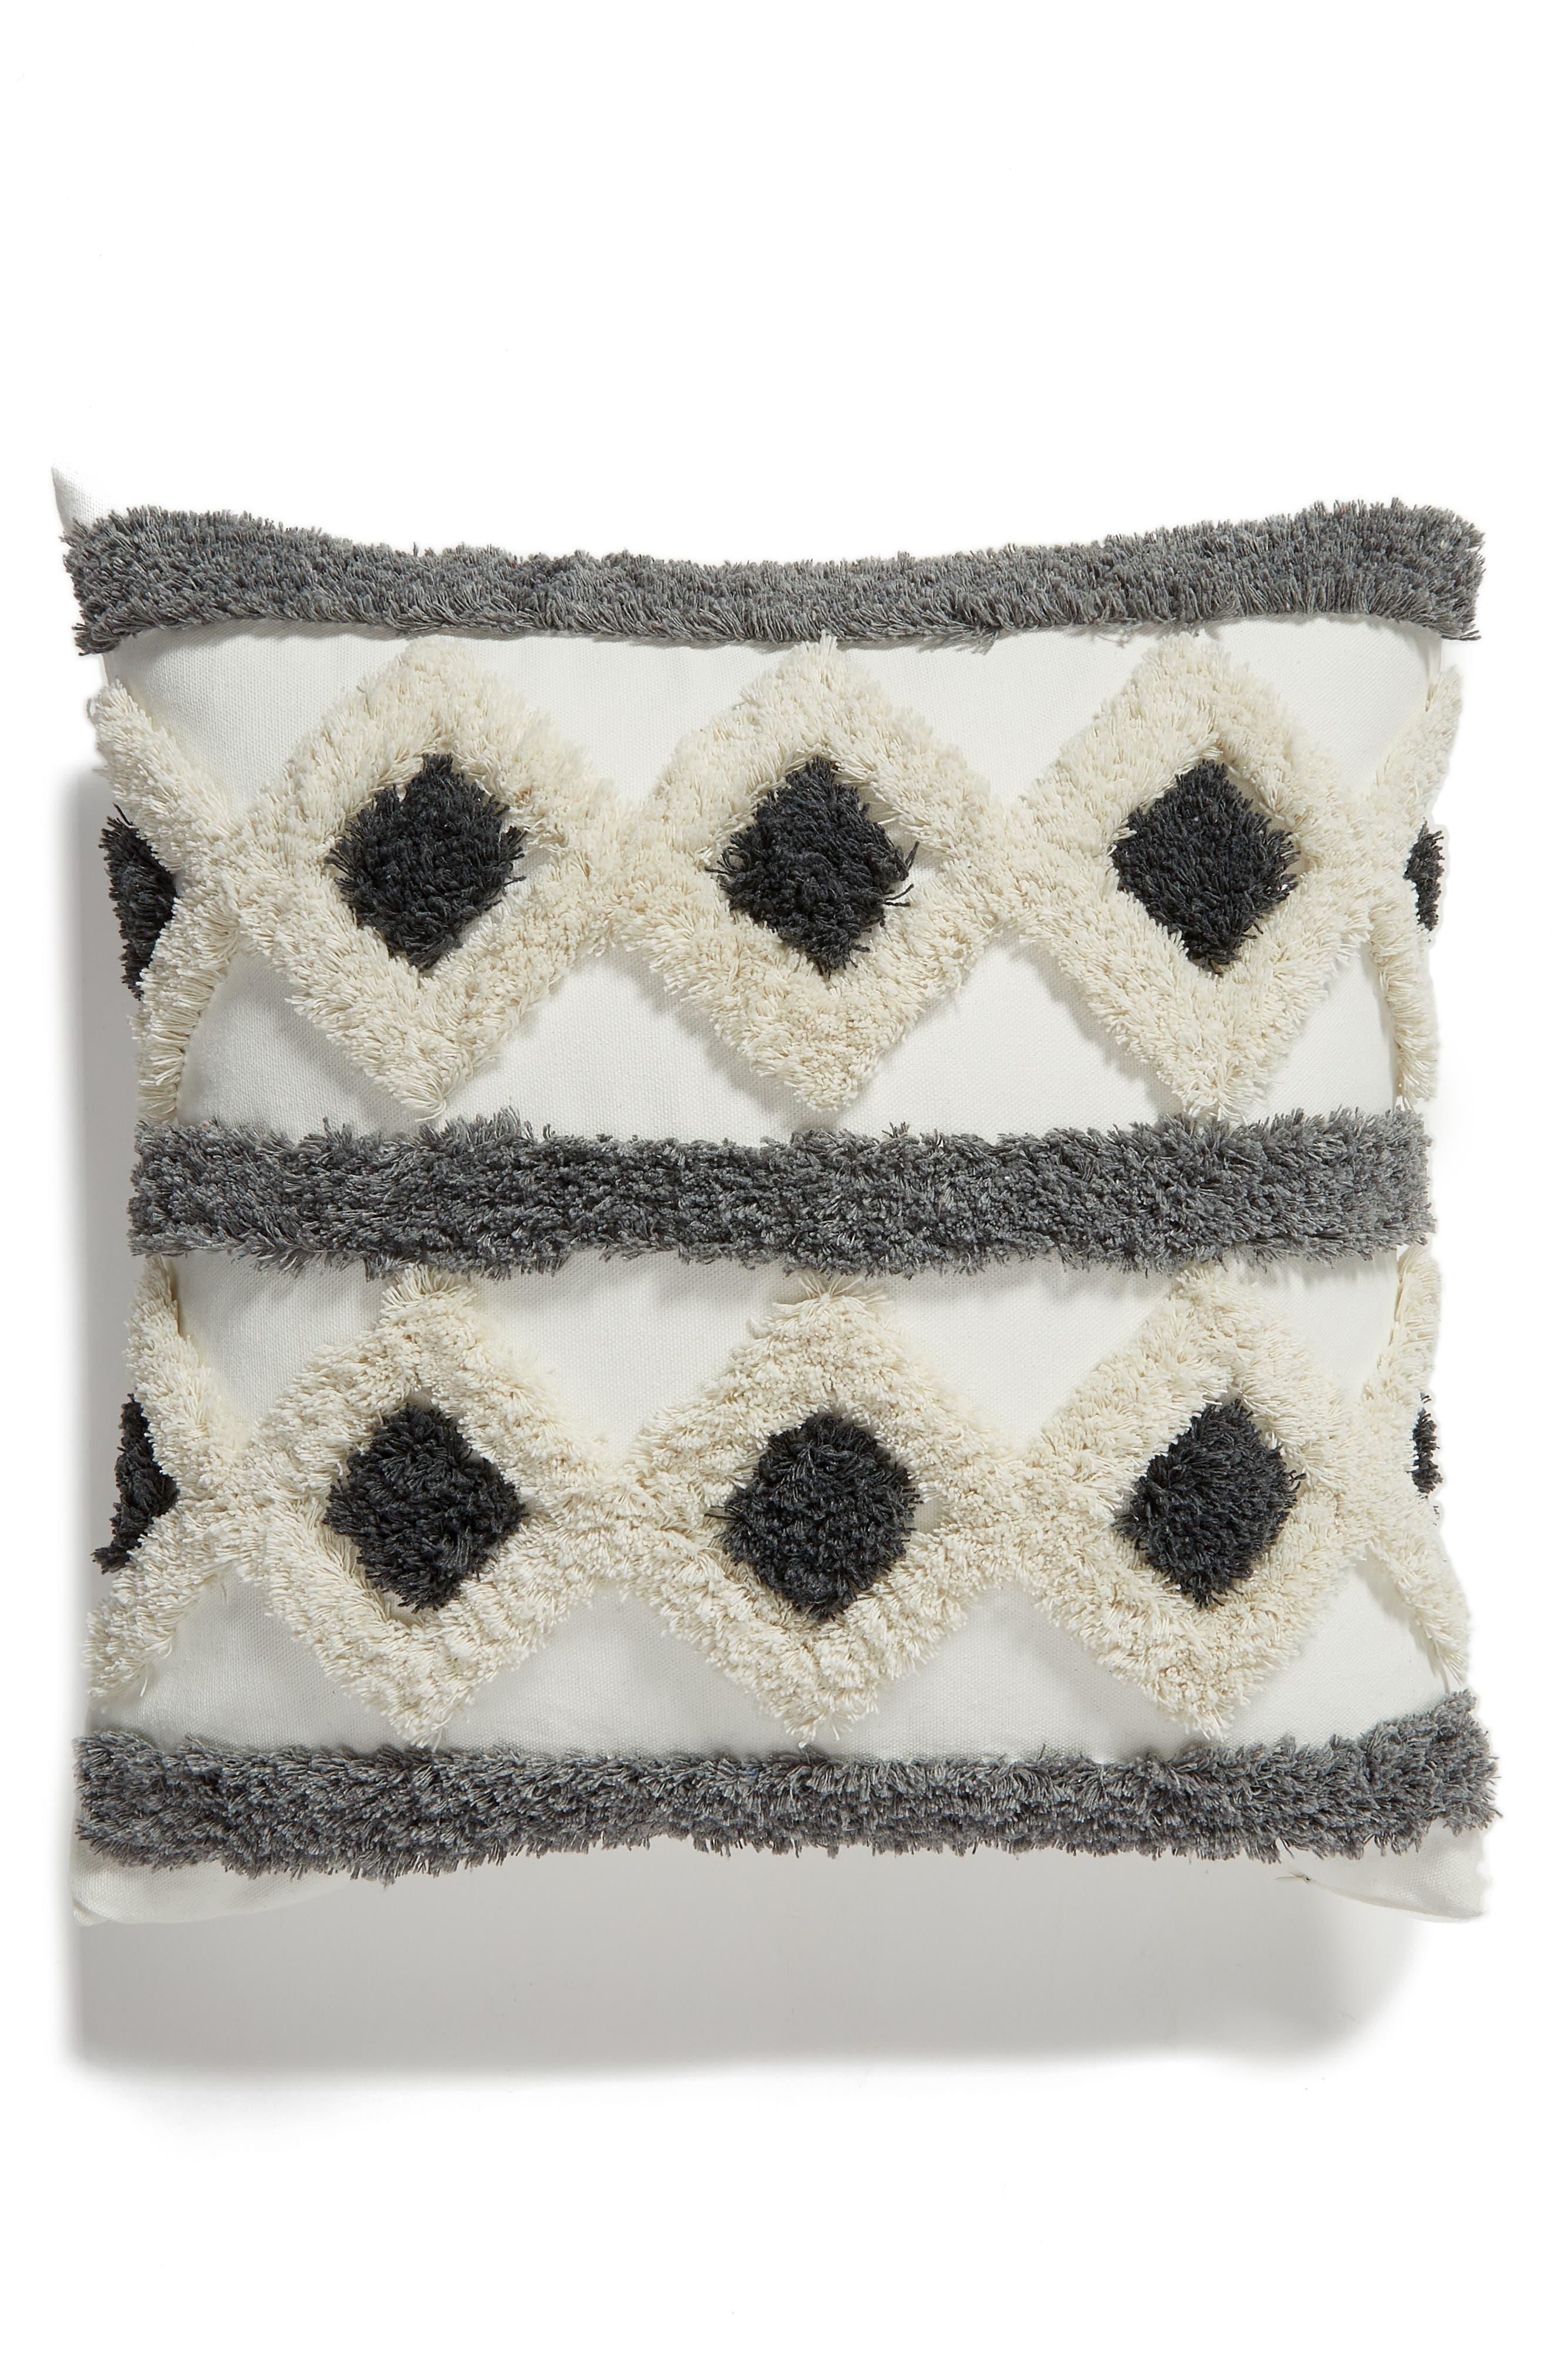 Tufted Diamond Accent Pillow,                             Main thumbnail 1, color,                             GREY